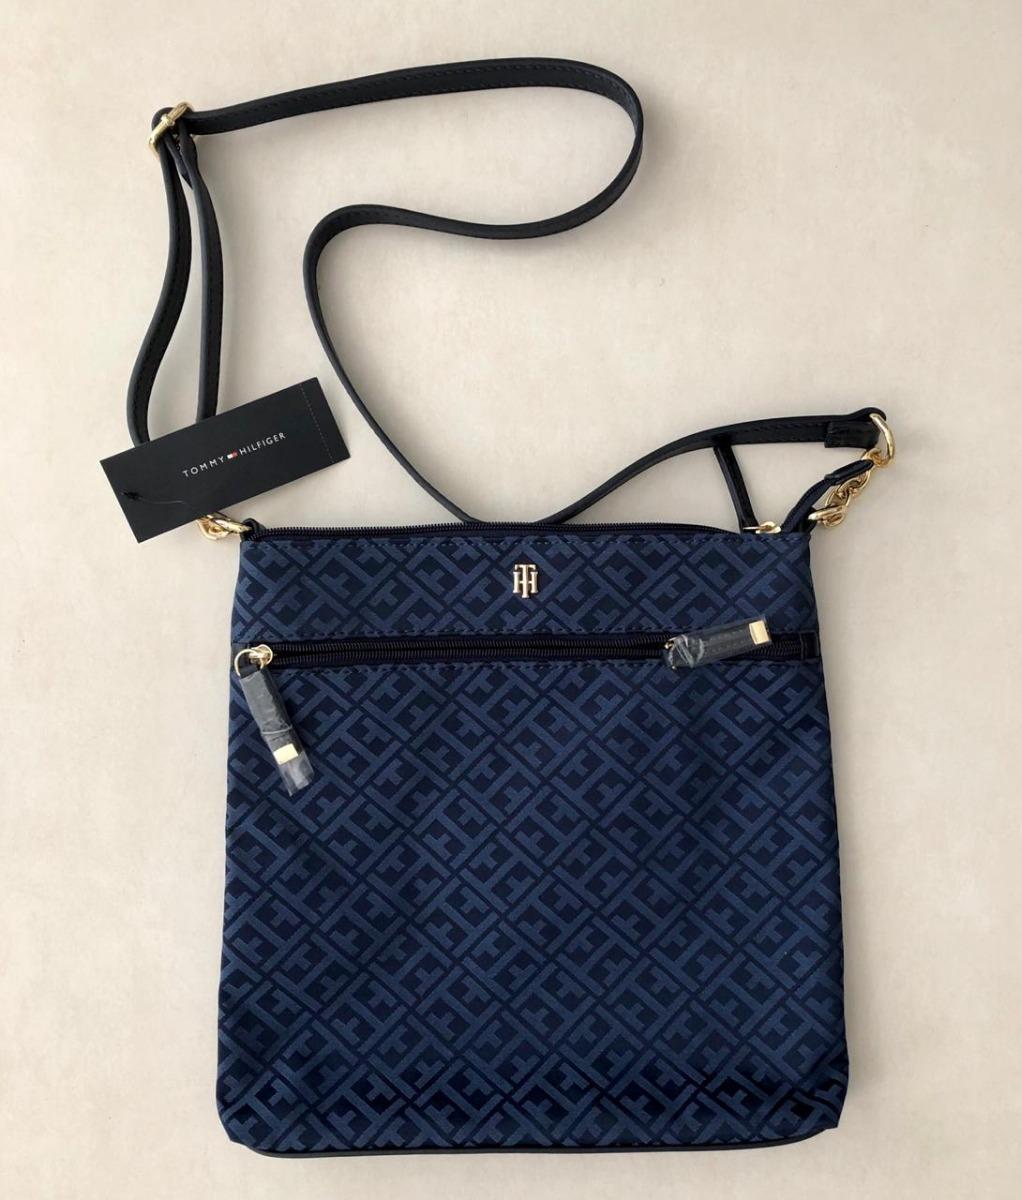 e4277c4fd bolsa tommy hilfiger th azul escuro / claro ziper importada. Carregando zoom .